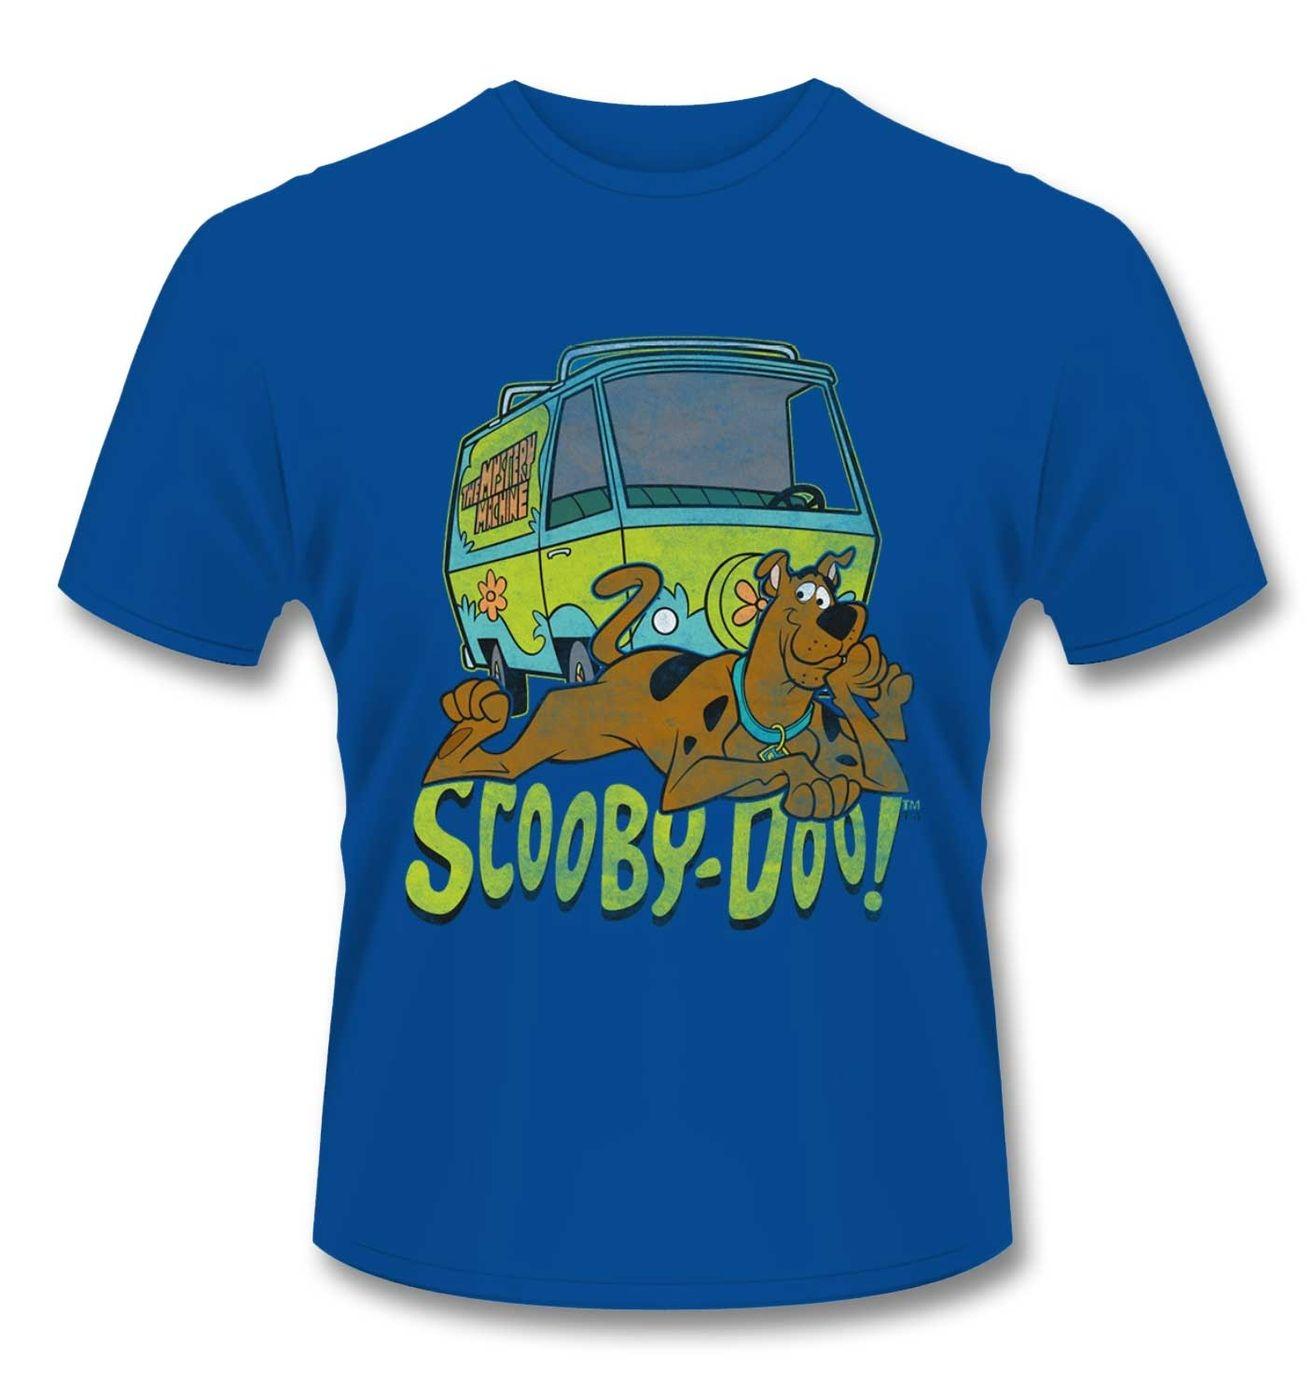 Official Hanna Barbera Scooby Doo Mystery Machine t-shirt